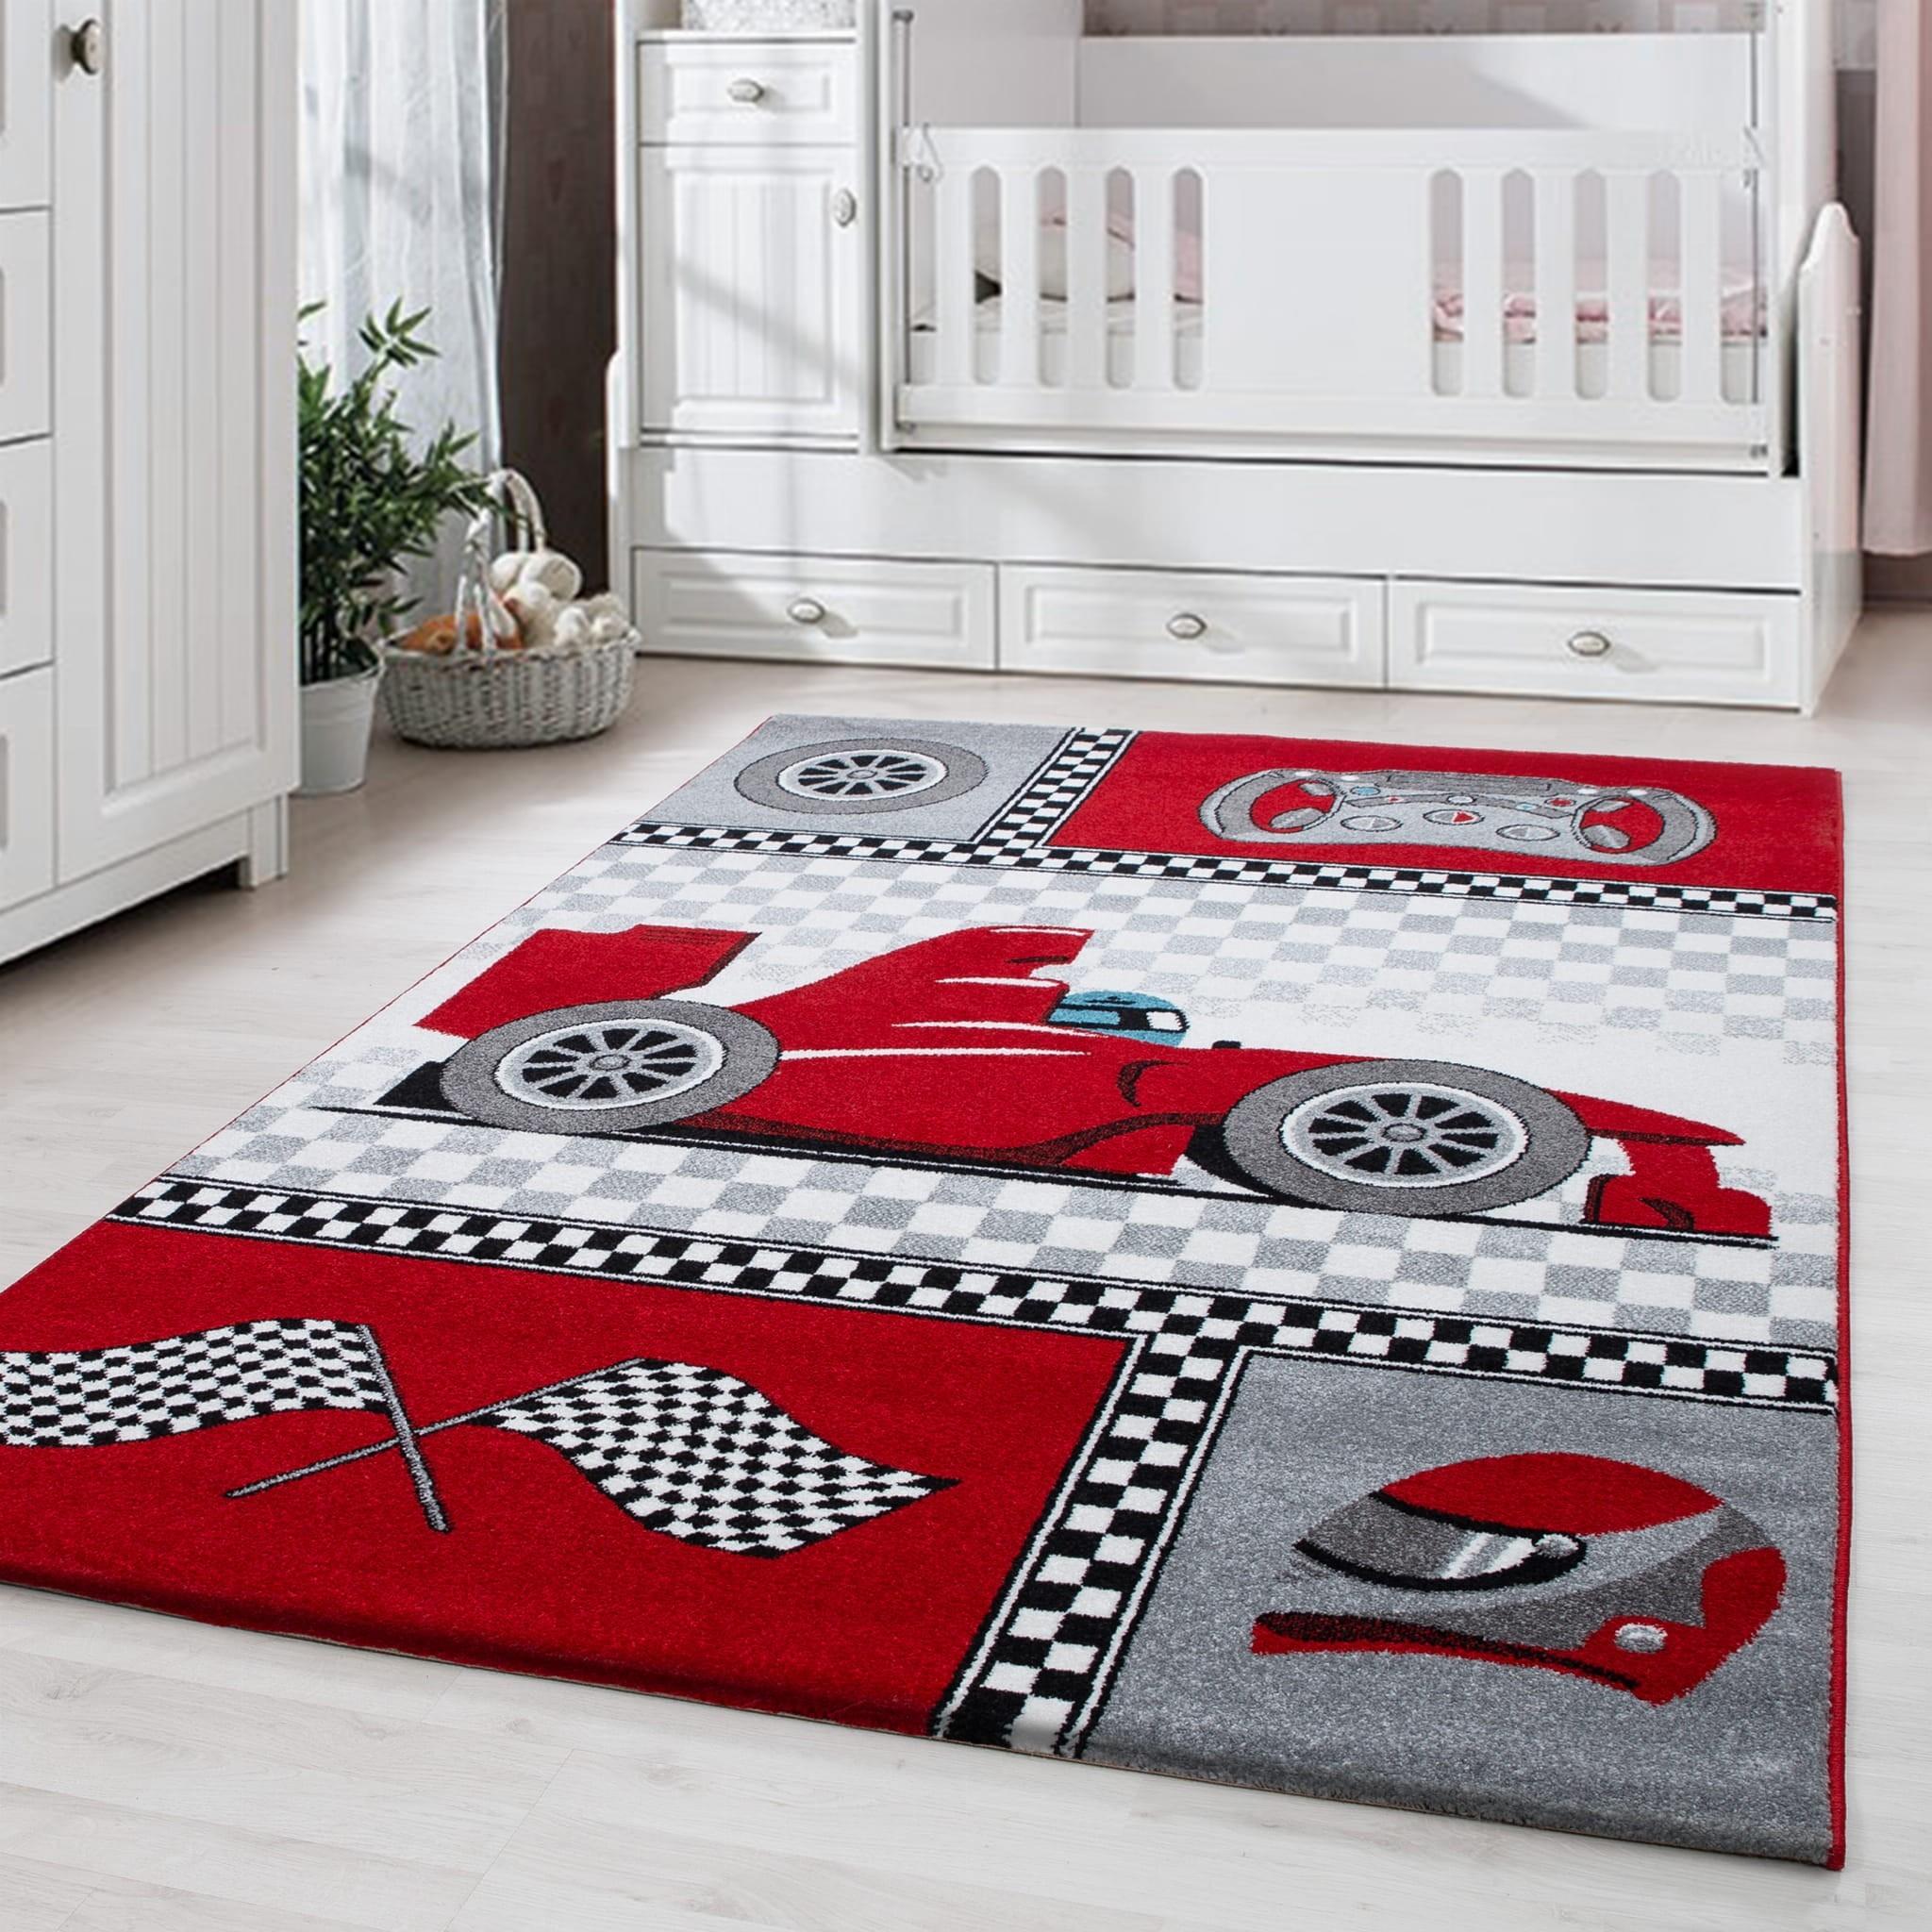 Červený koberec do chlapecké pokoje formule